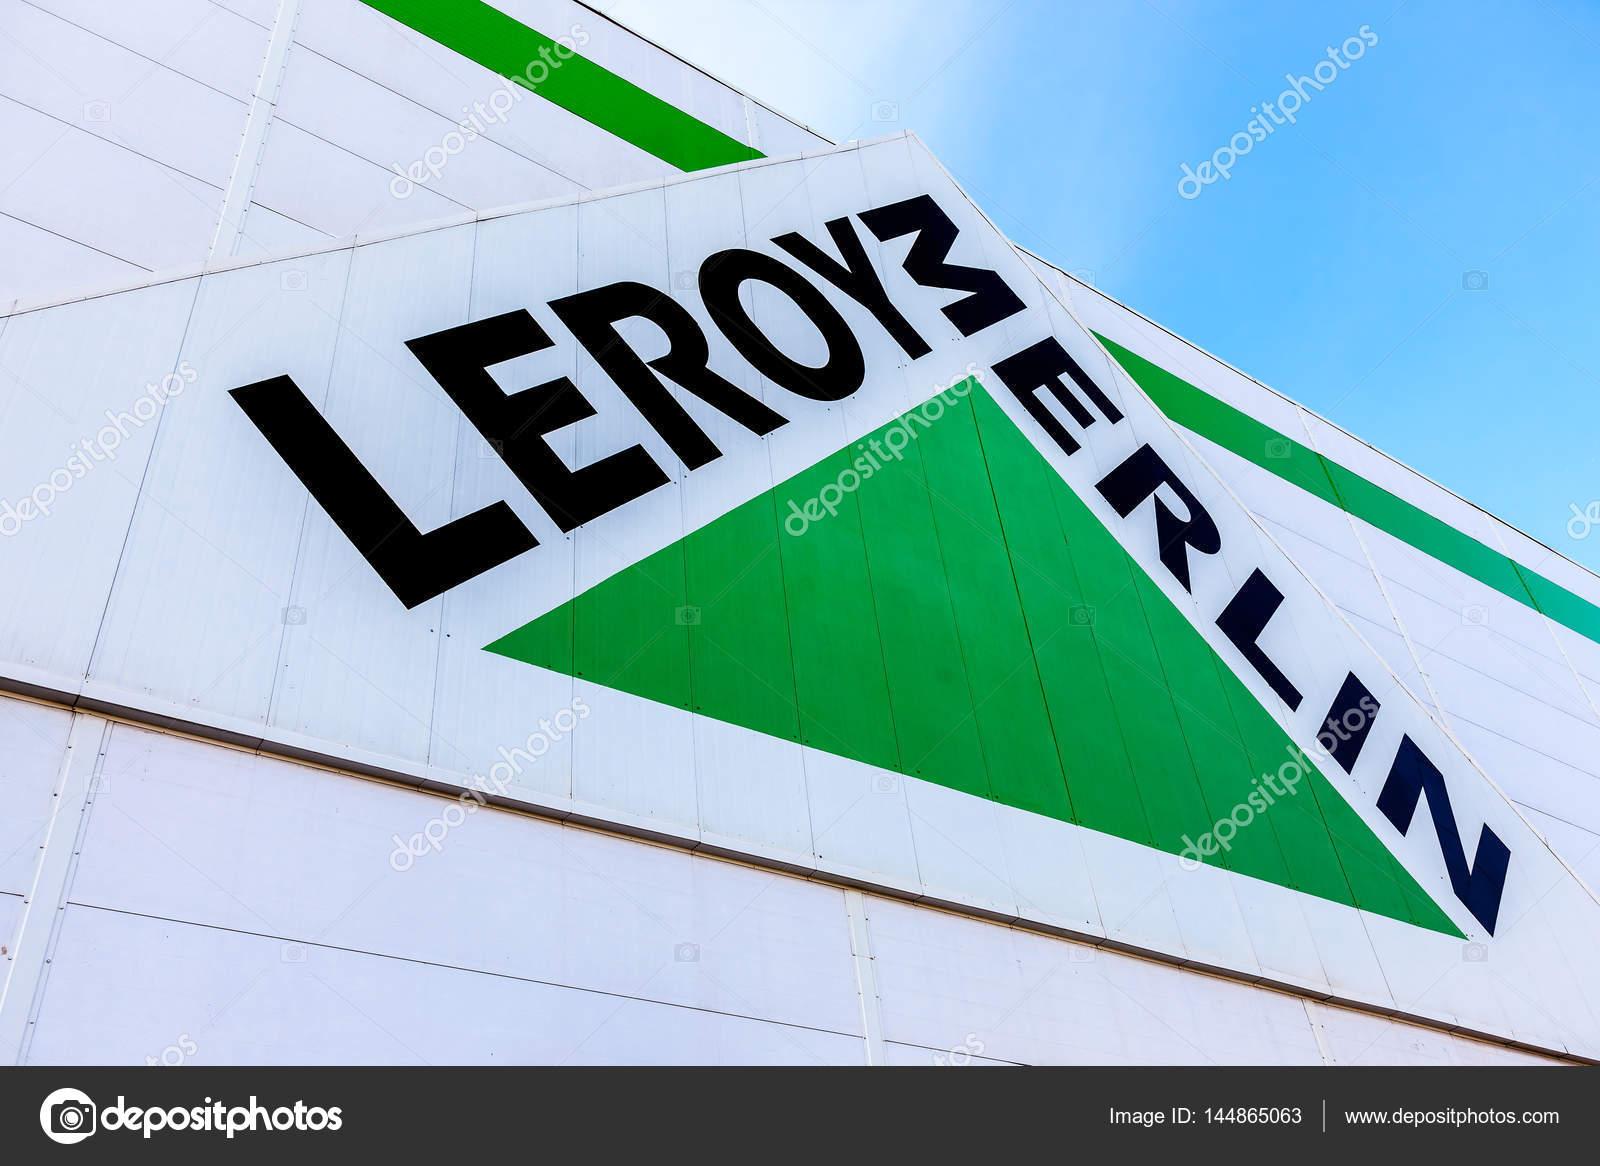 leroy merlin brand sign against blue sky stock editorial. Black Bedroom Furniture Sets. Home Design Ideas